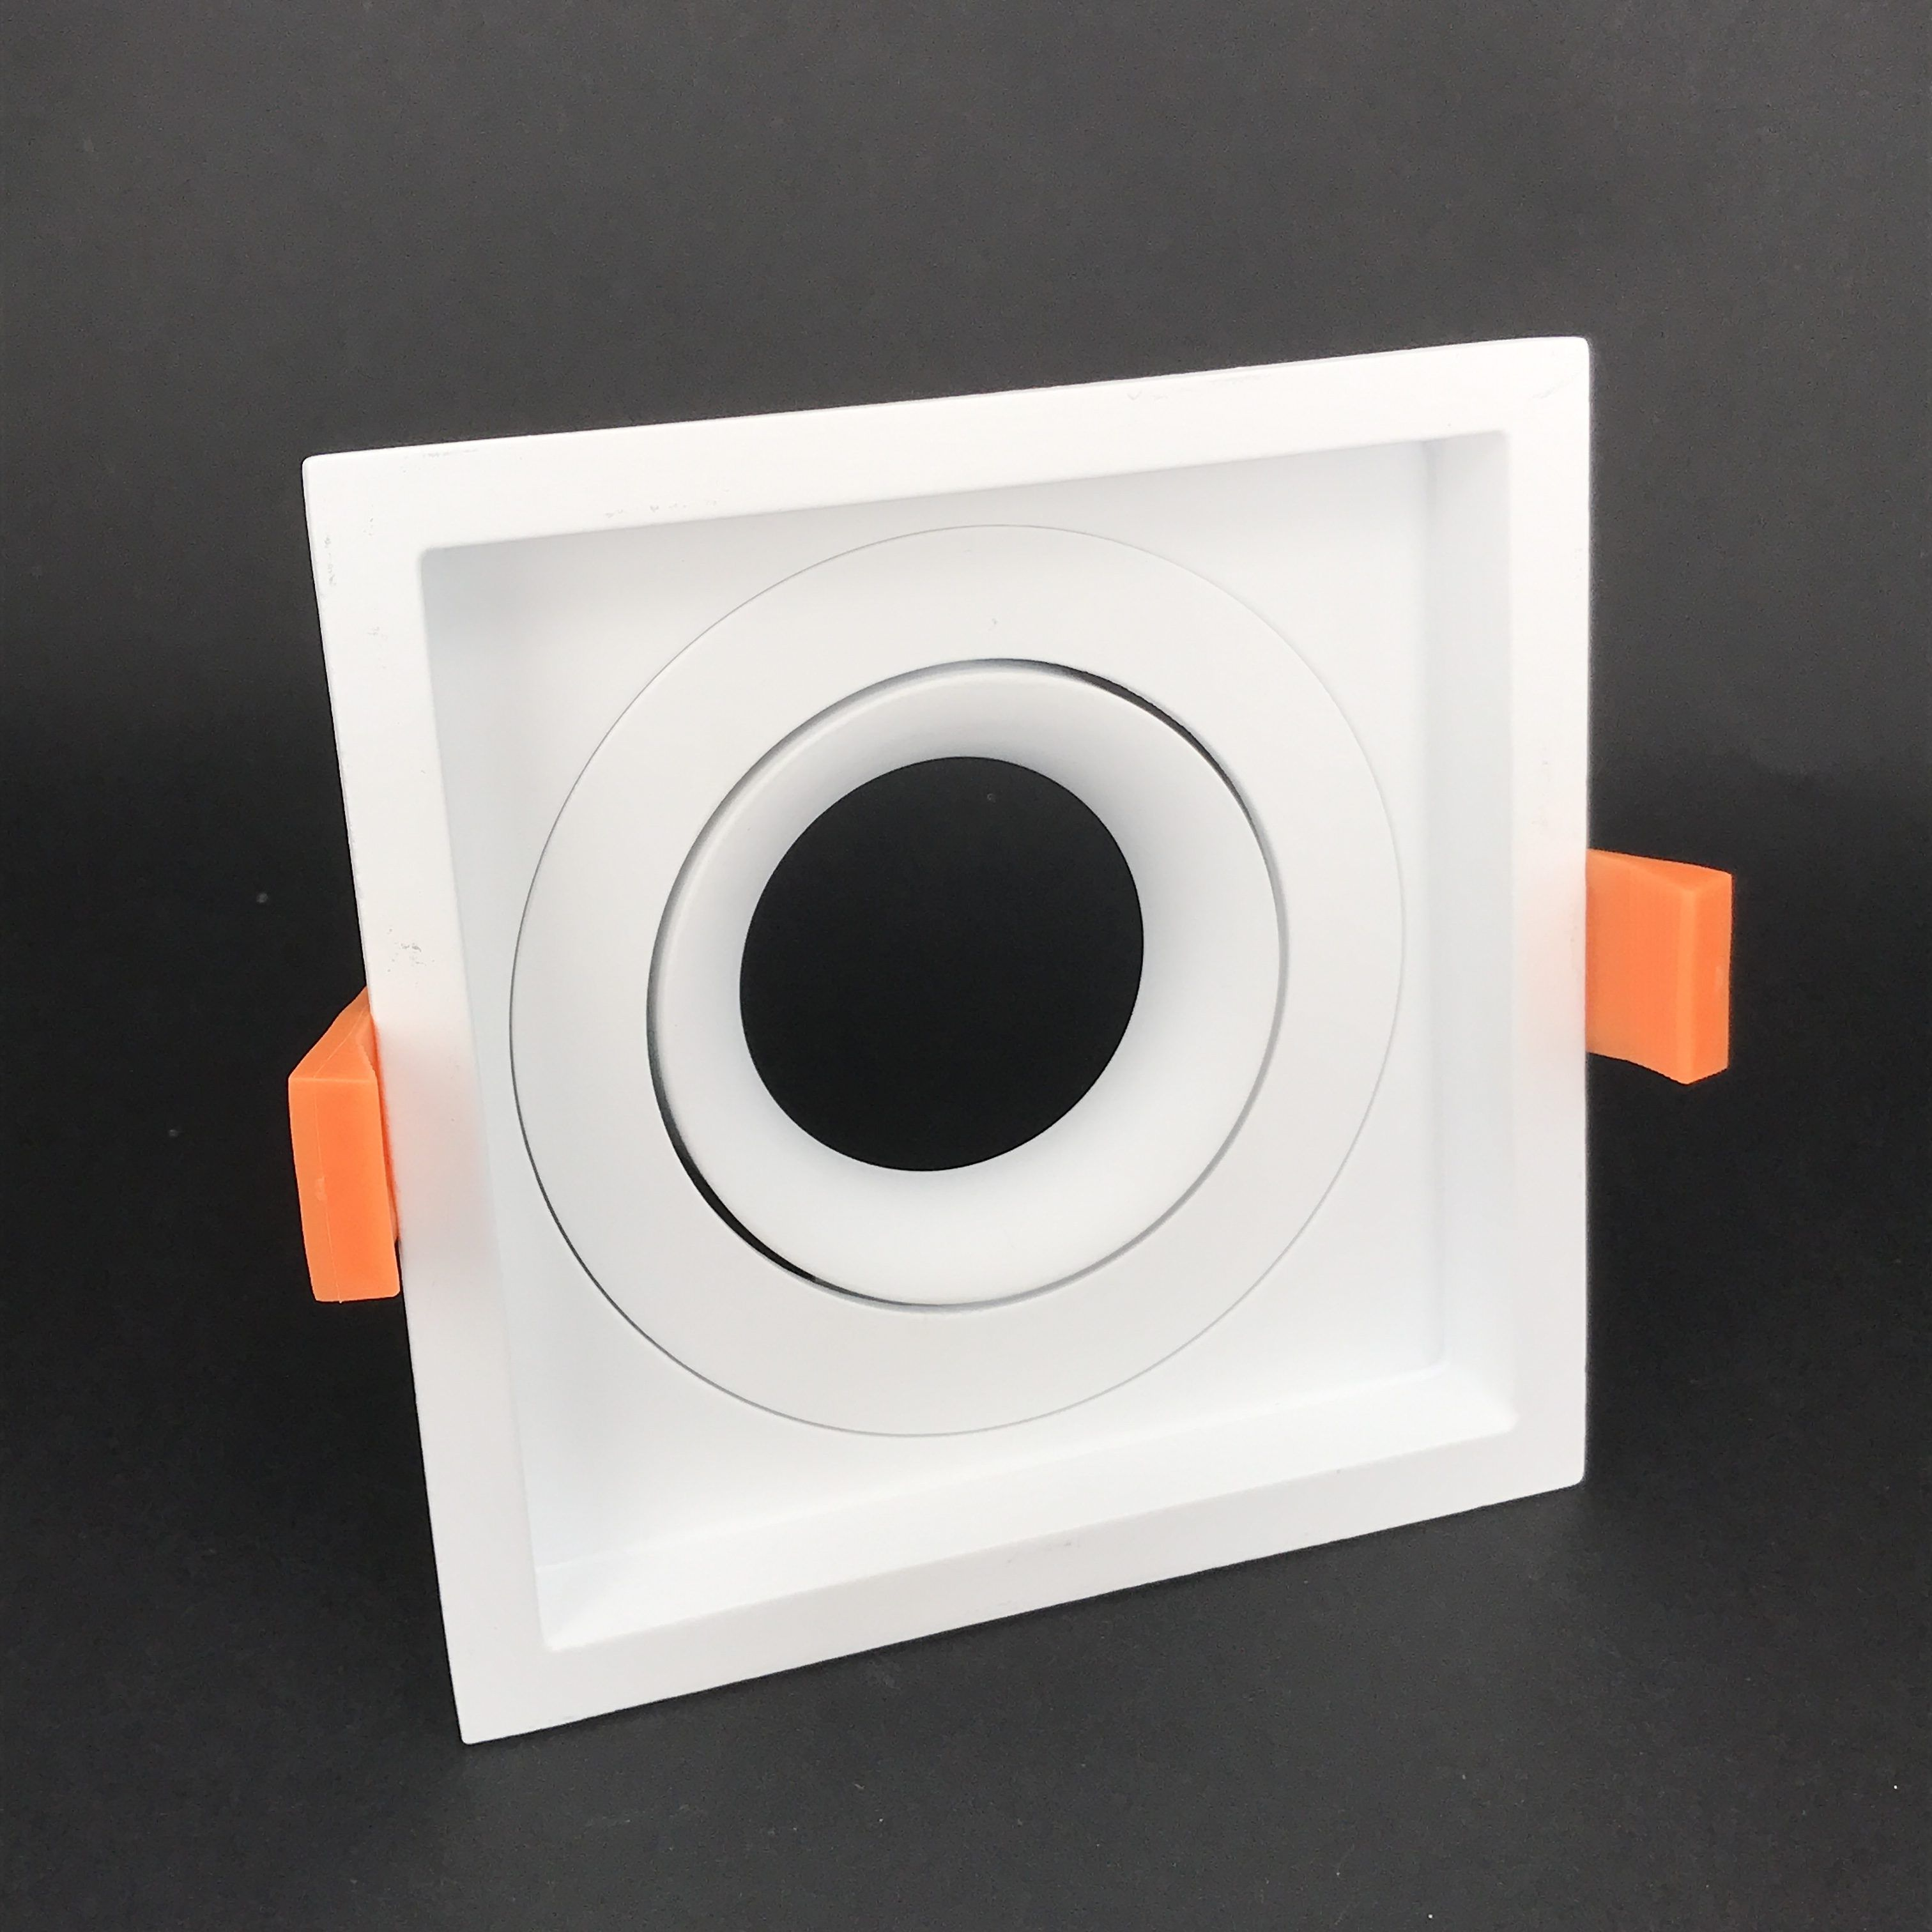 Inbouwring 110mm vierkant instelbaar wit